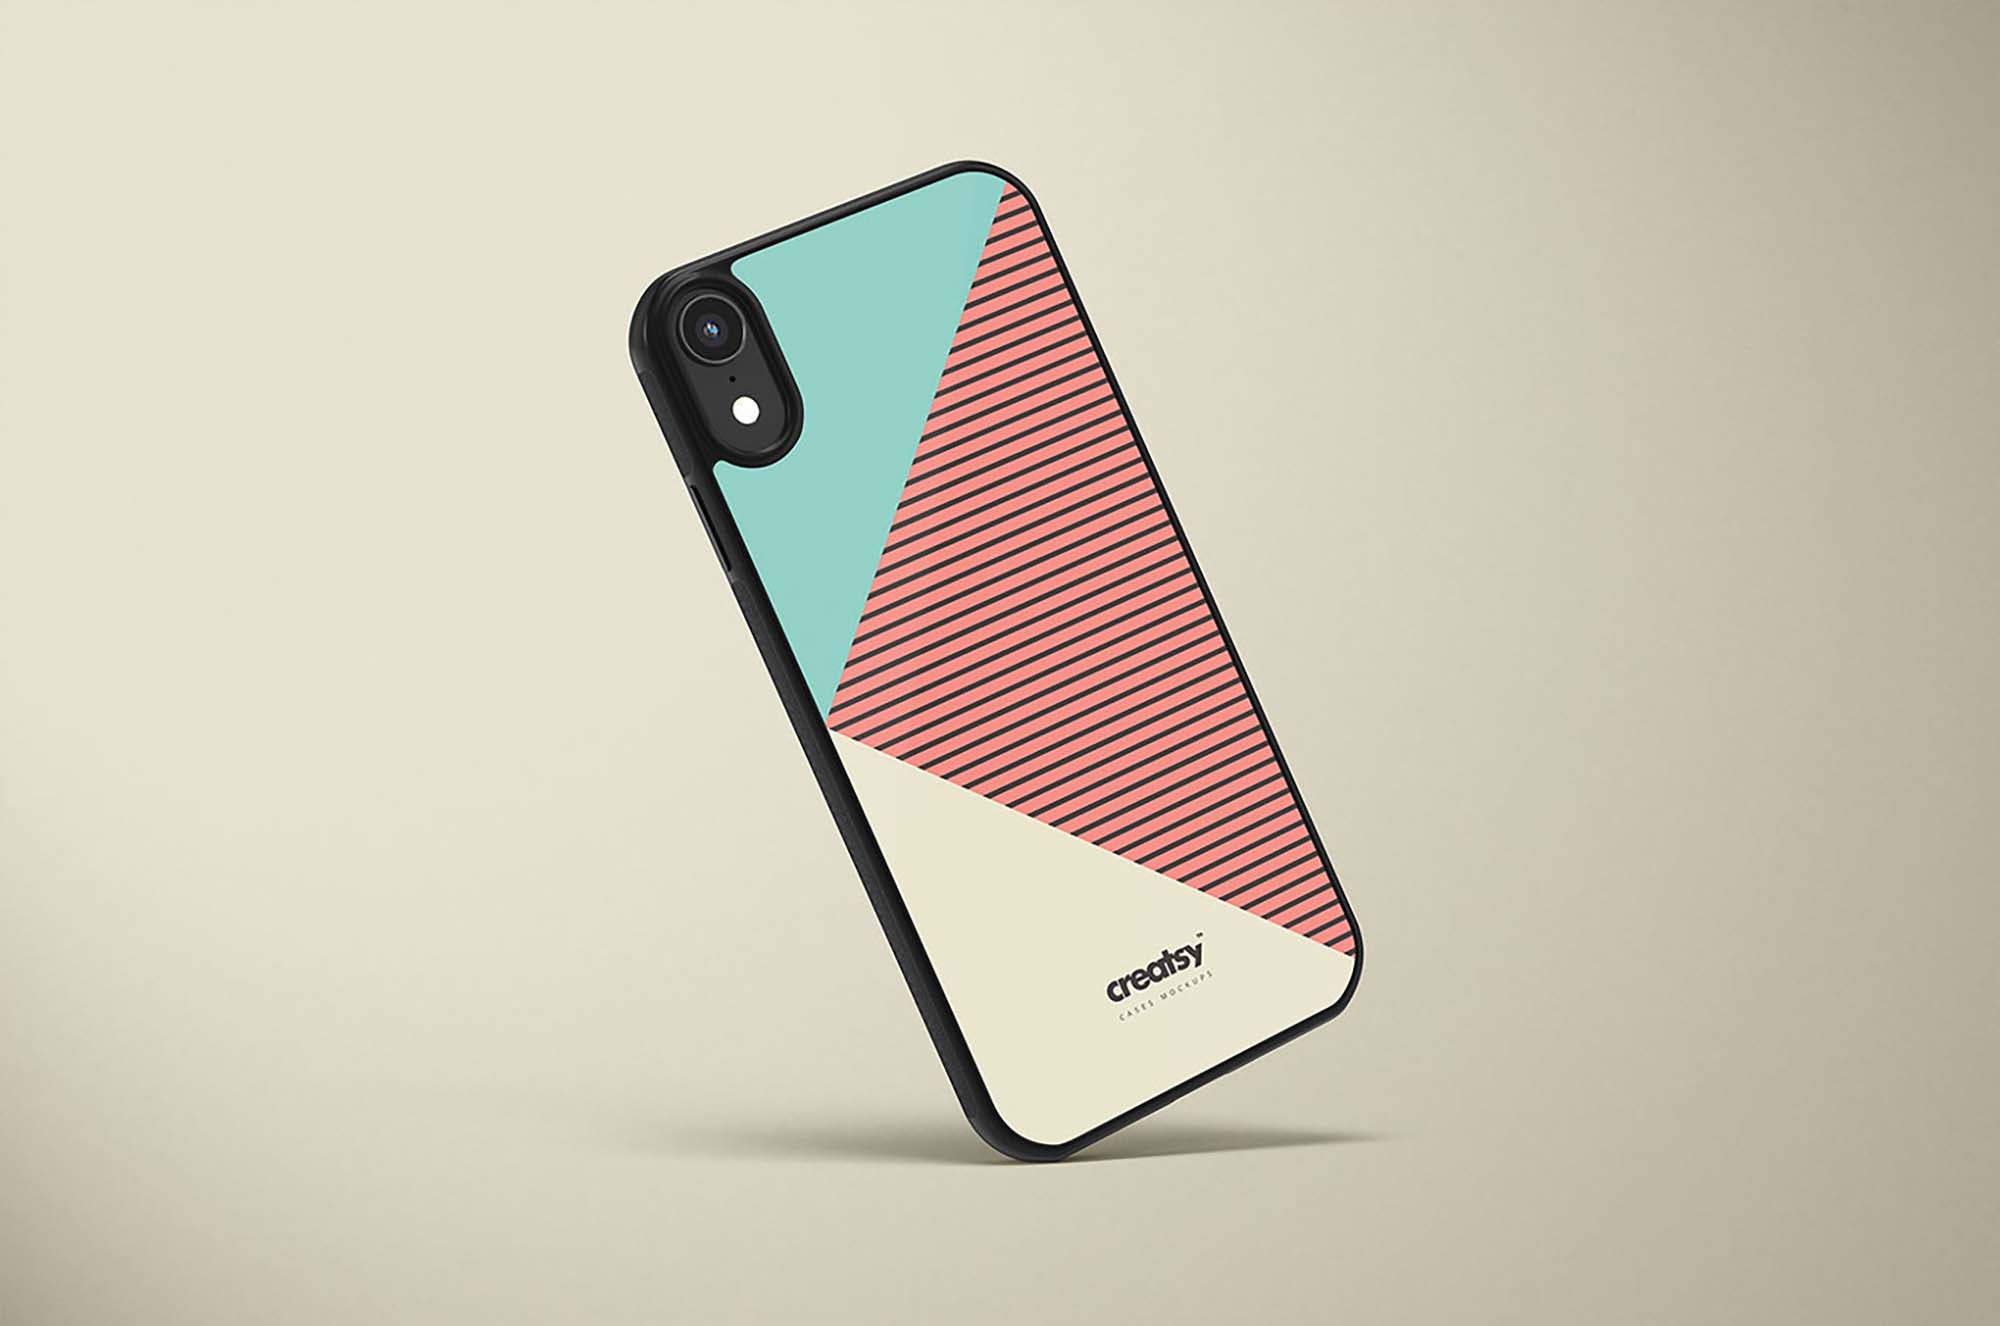 iPhone XR Case Mockup